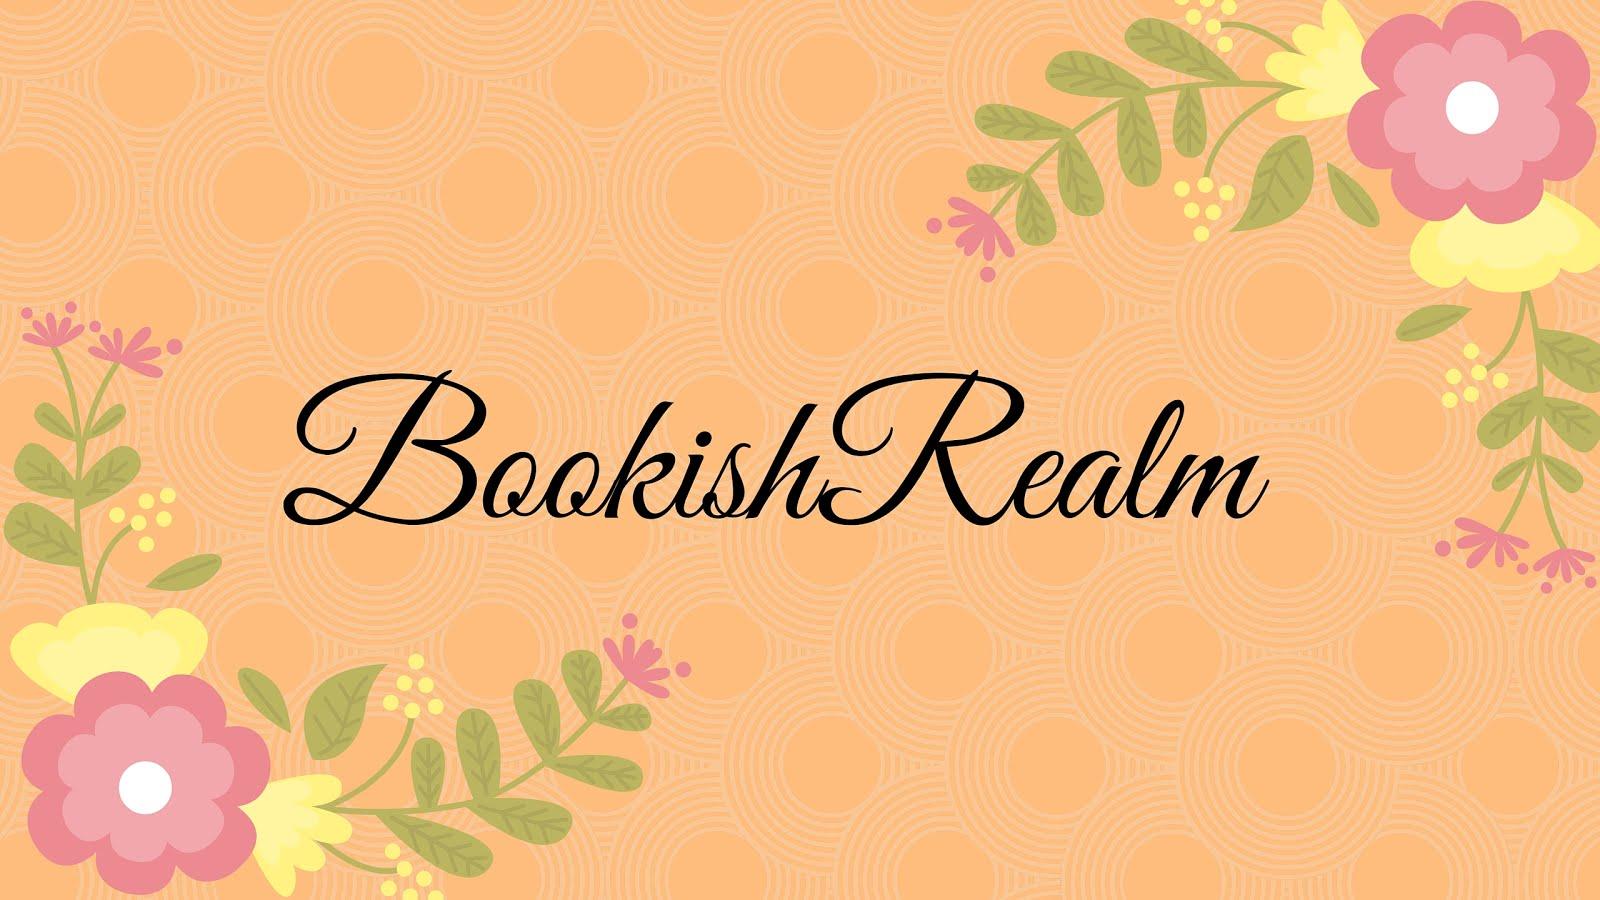 BookishRealm